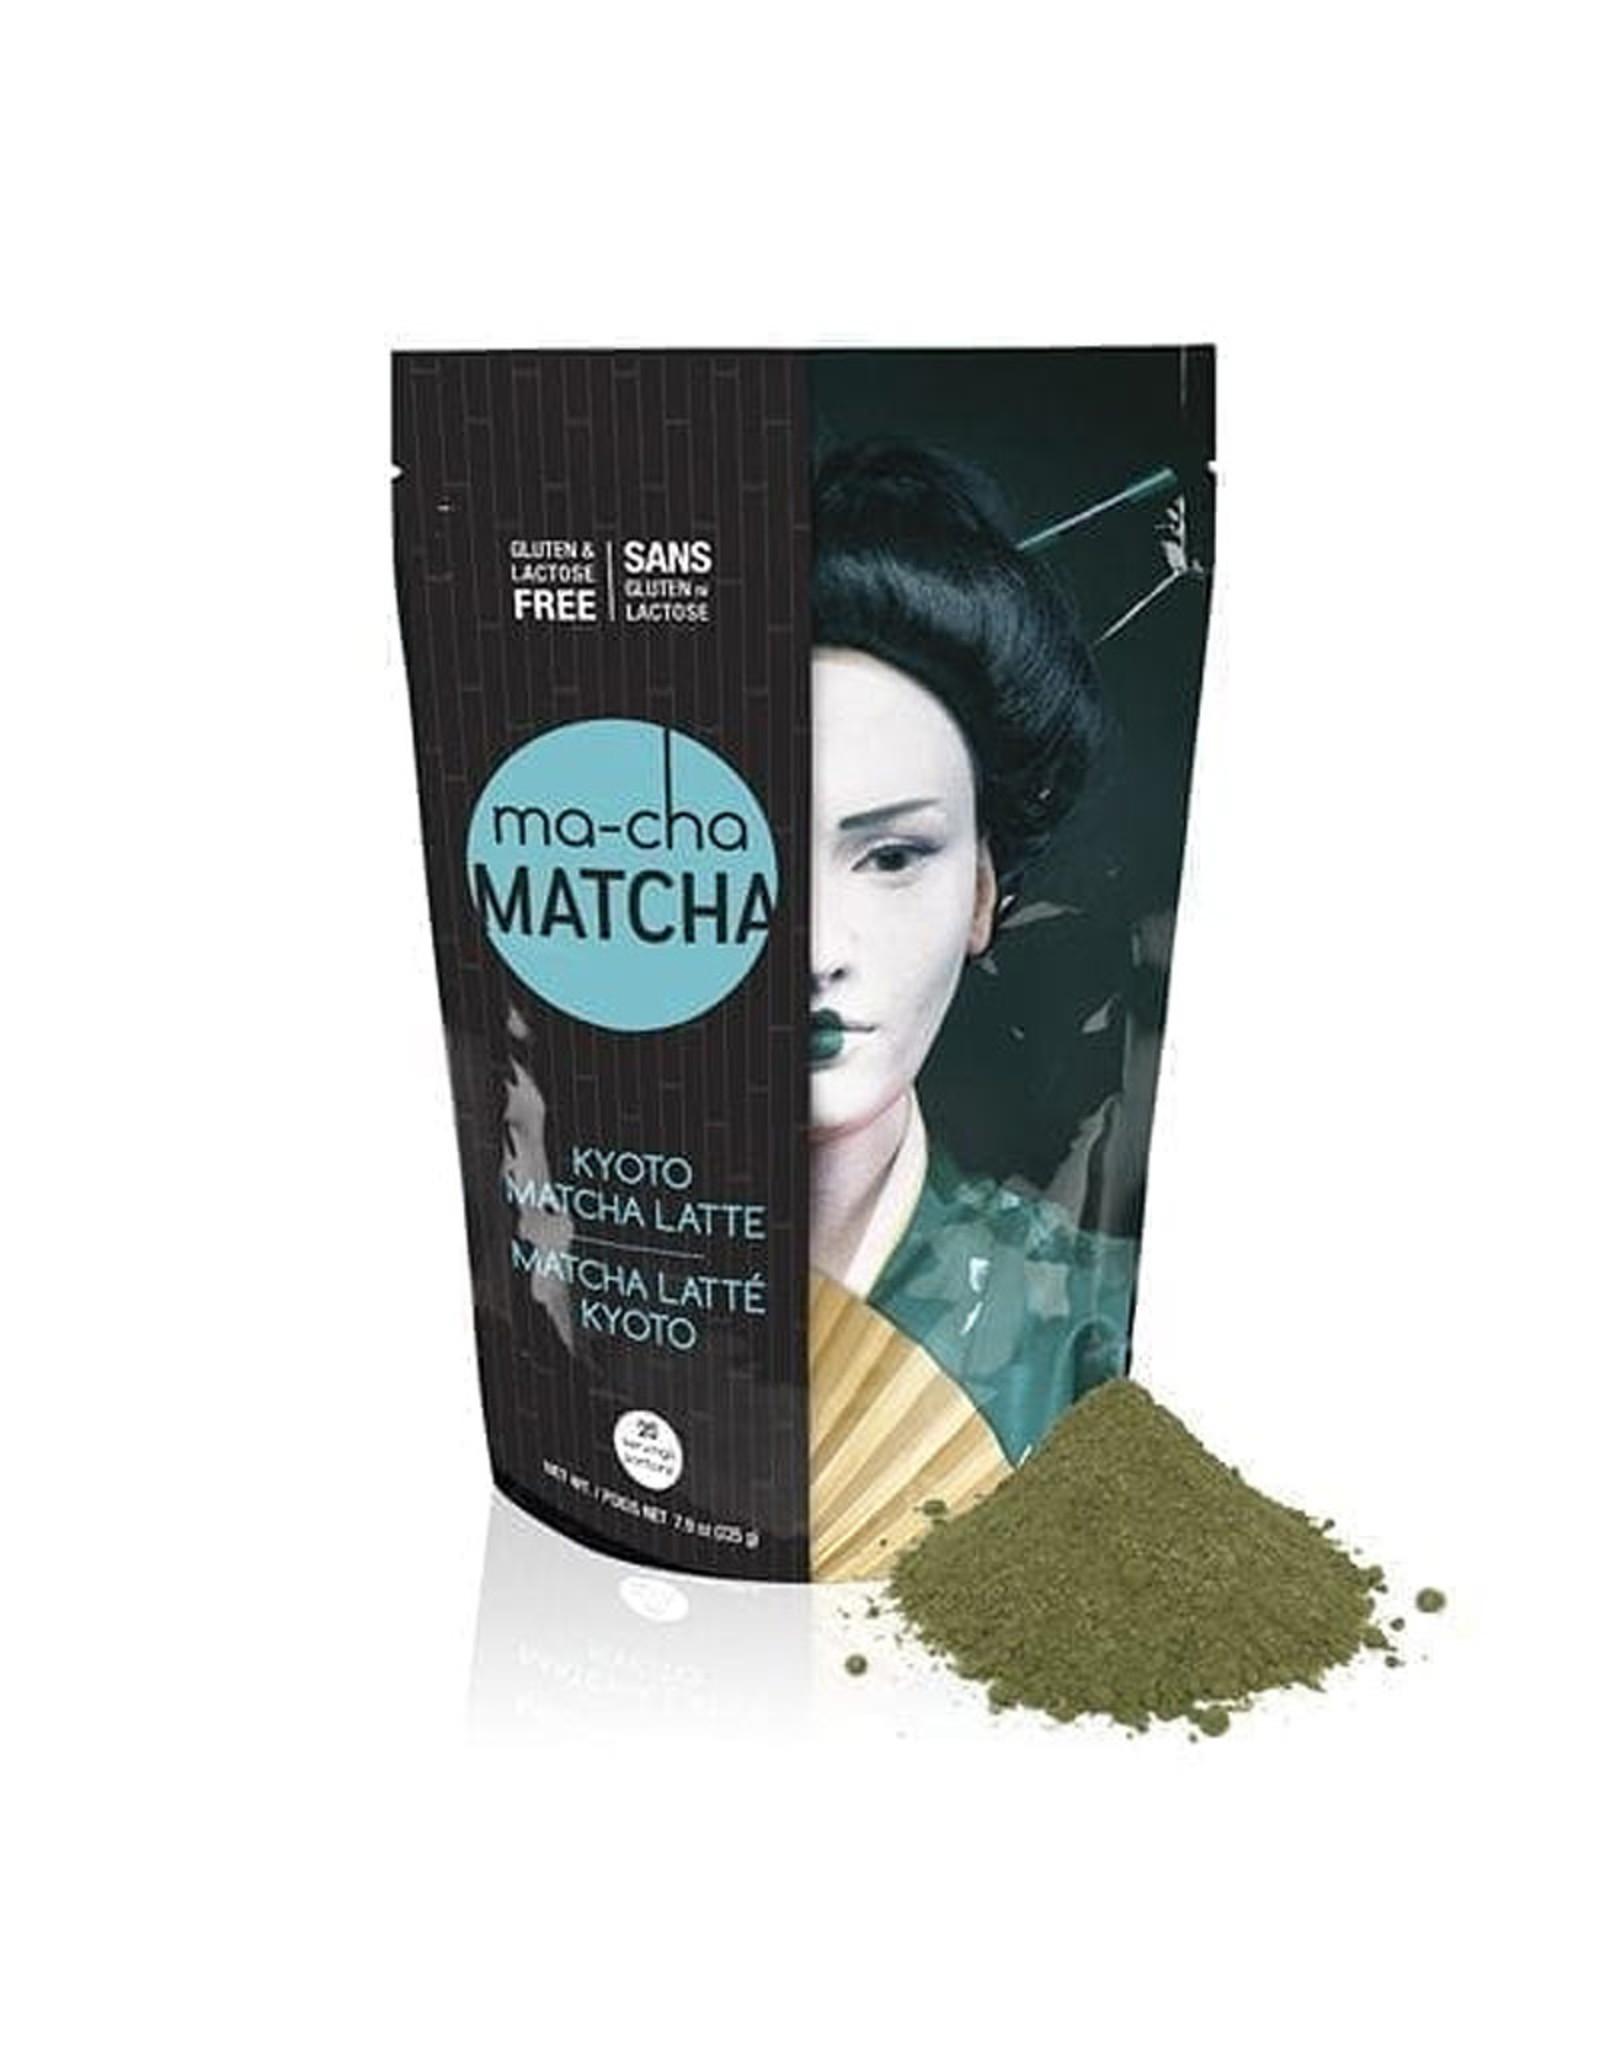 Tea Squared Tea Squared - Kyoto Matcha Latte (225g)